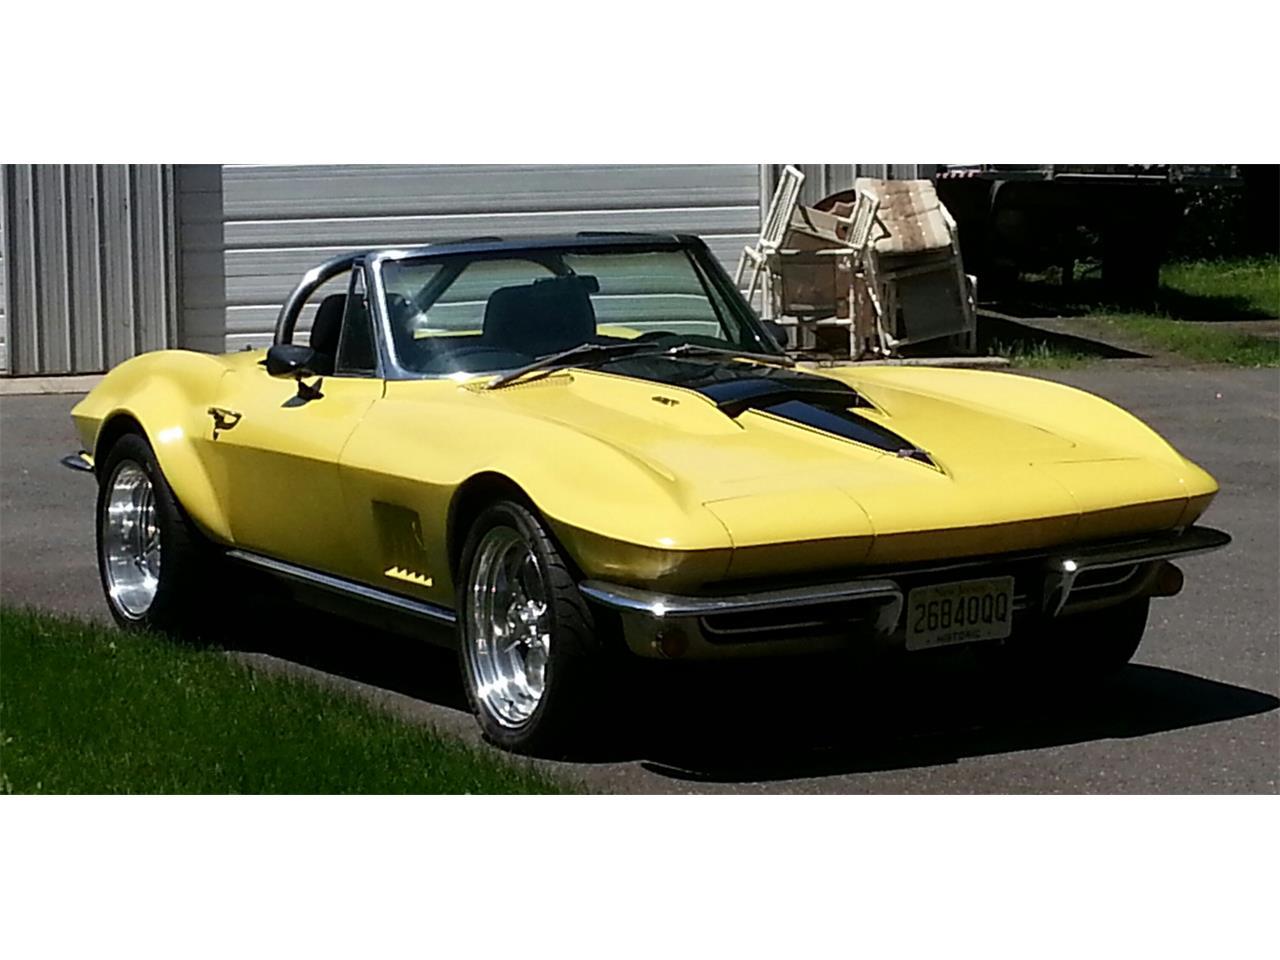 1967 Chevrolet Corvette (CC-1242317) for sale in Monroe Twp, New Jersey